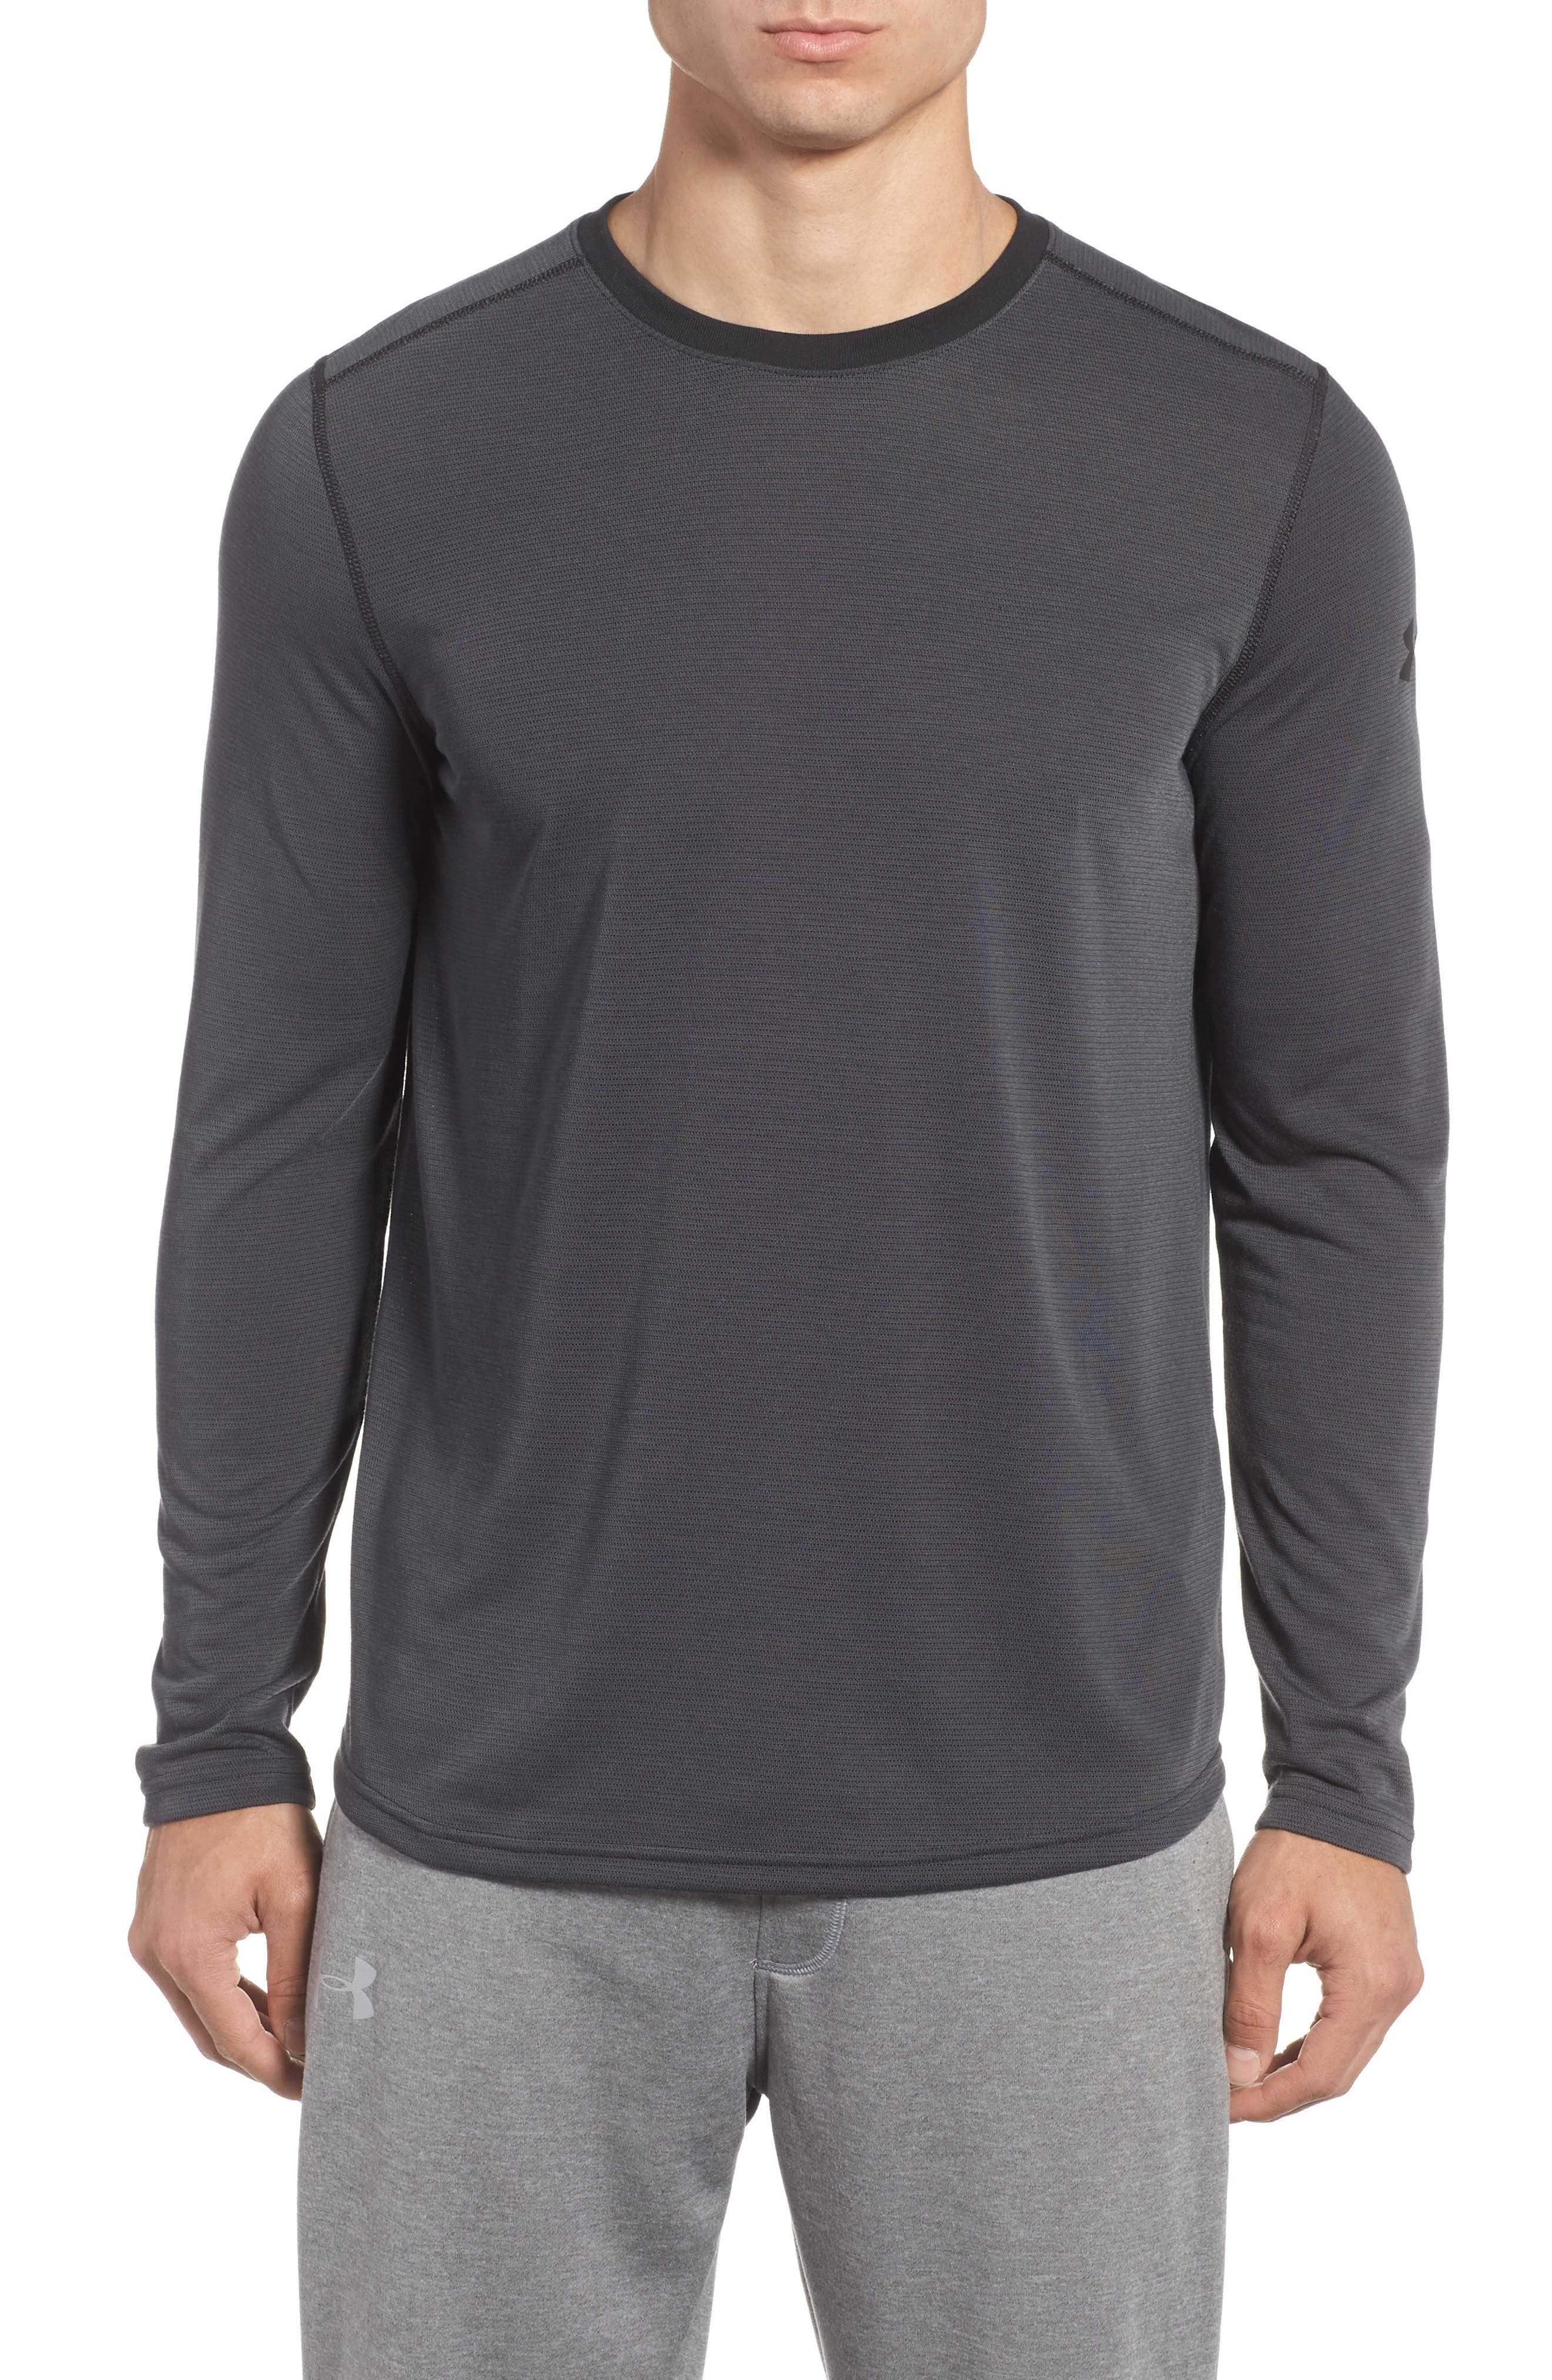 Threadborne Performance T-Shirt,                             Main thumbnail 1, color,                             020